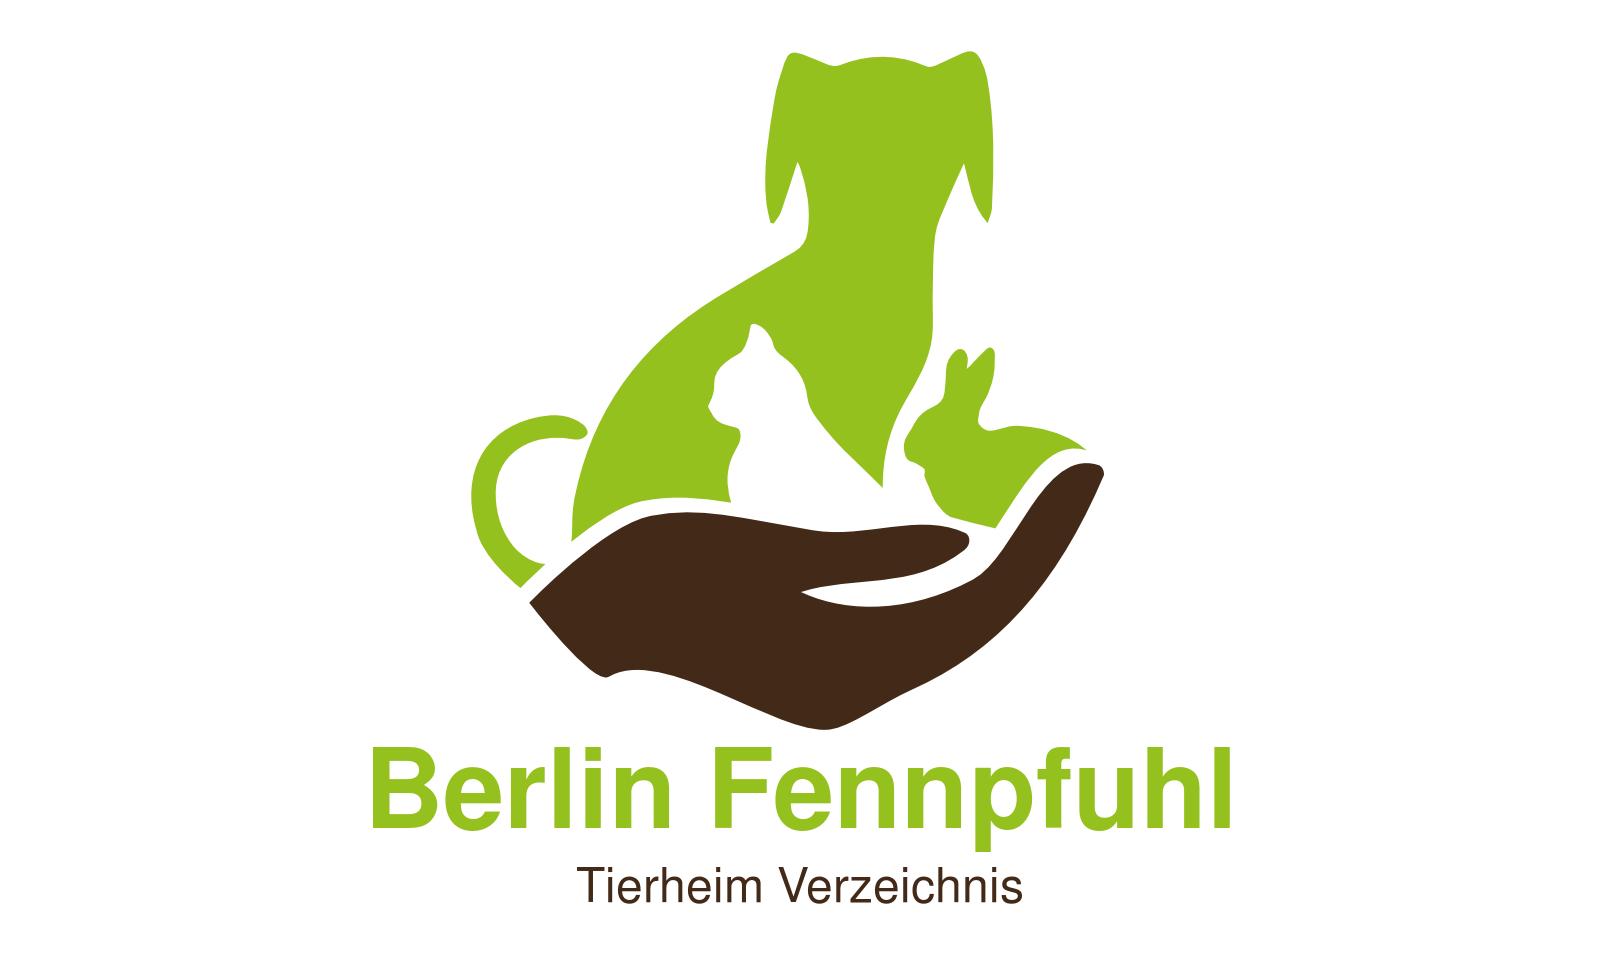 Tierheim Berlin Fennpfuhl